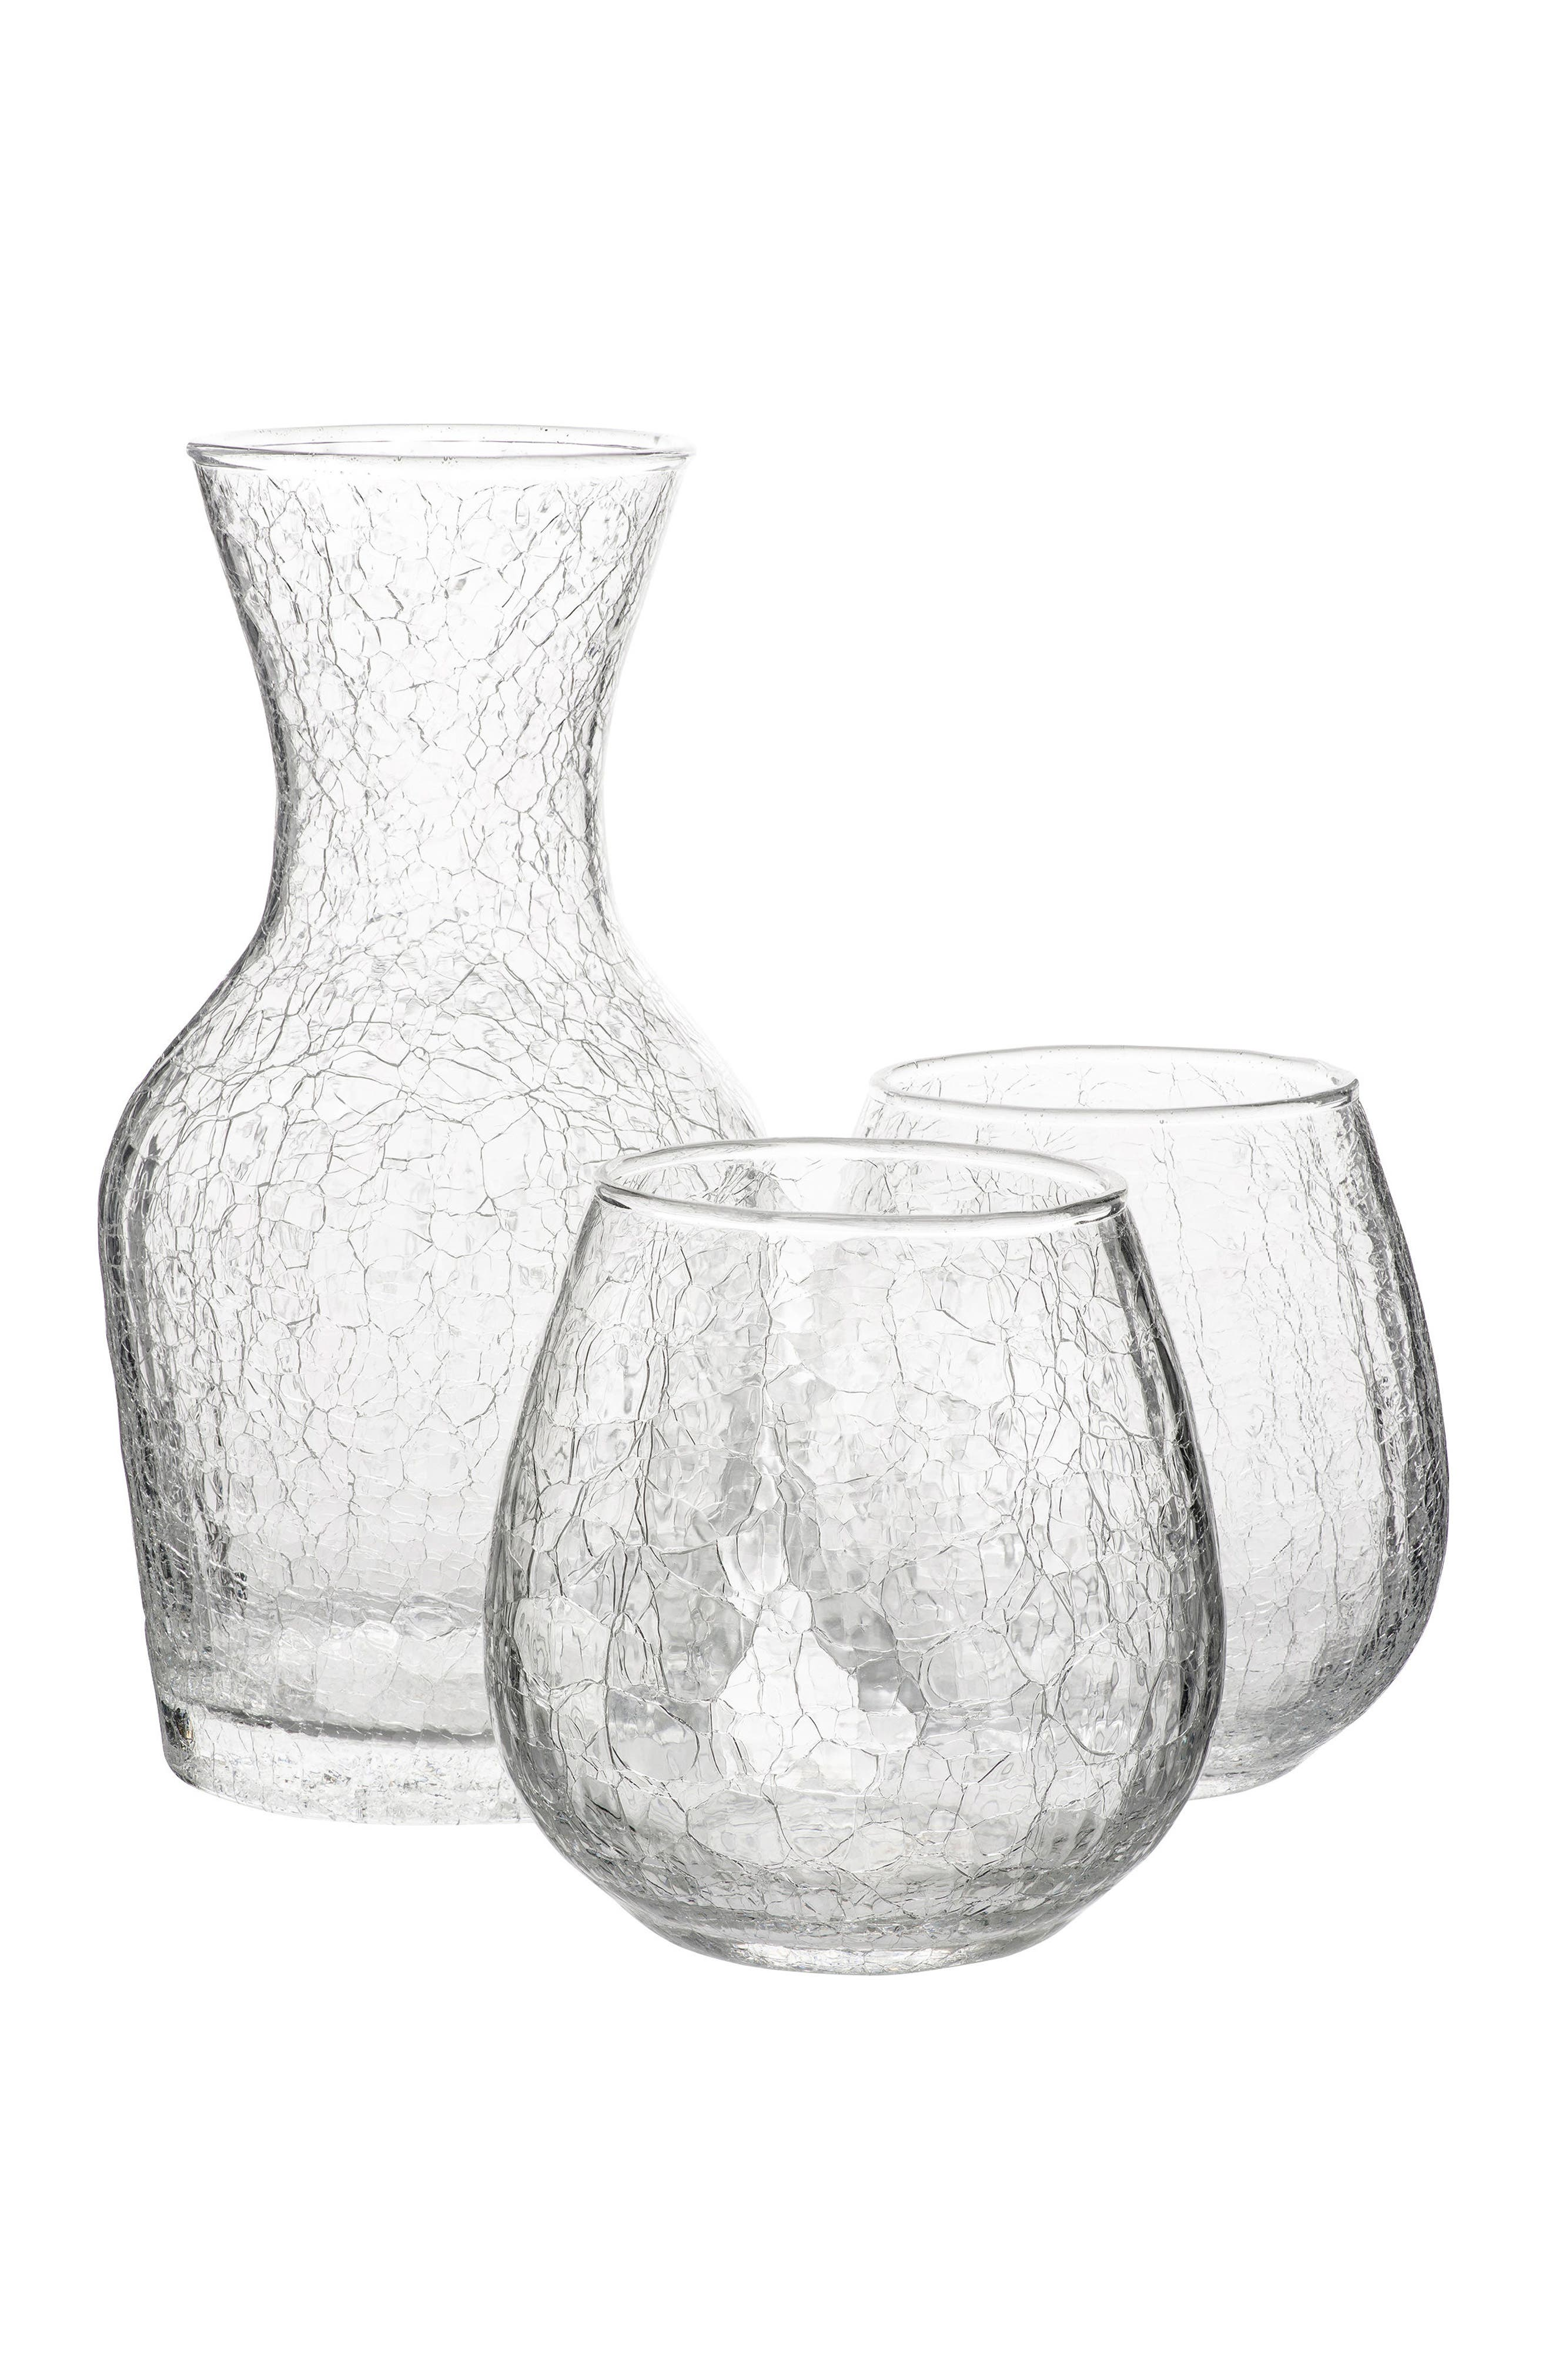 Hugo 3-Piece Carafe & Glasses Set,                         Main,                         color, Clear